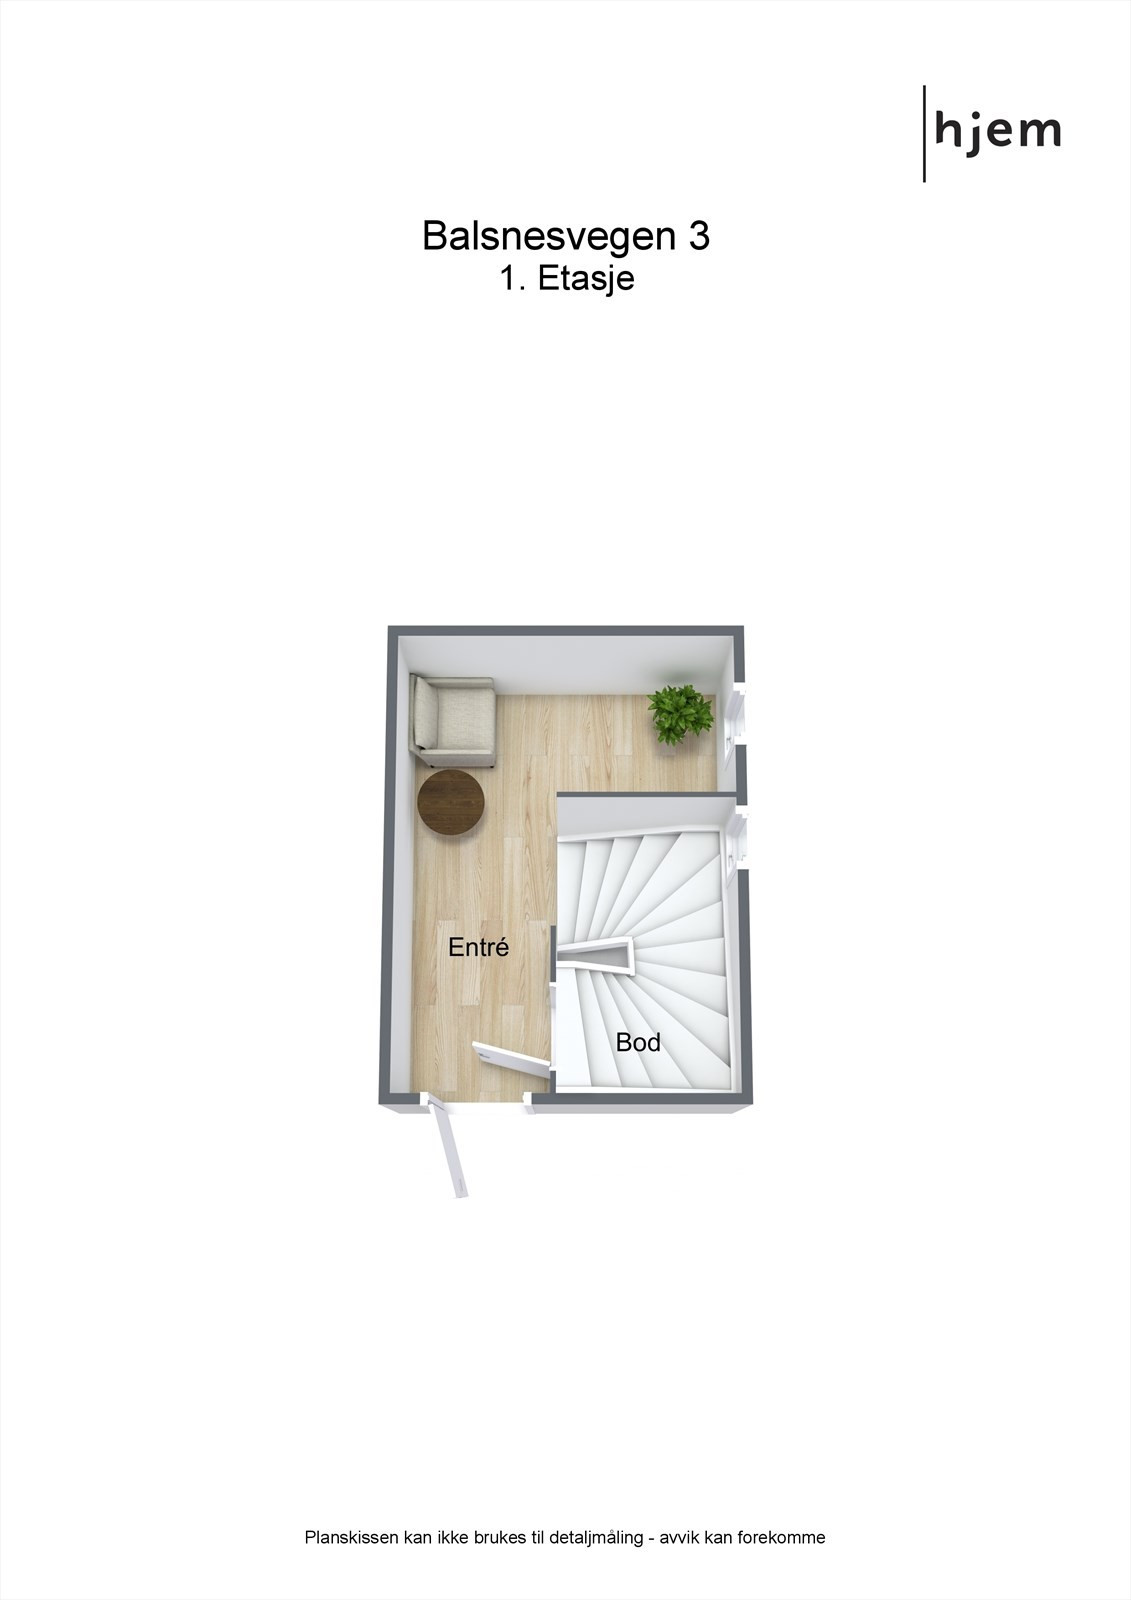 Floorplan letterhead - Balsnesvegen 3 - 1. Etasje - 3D Floor Plan.jpg